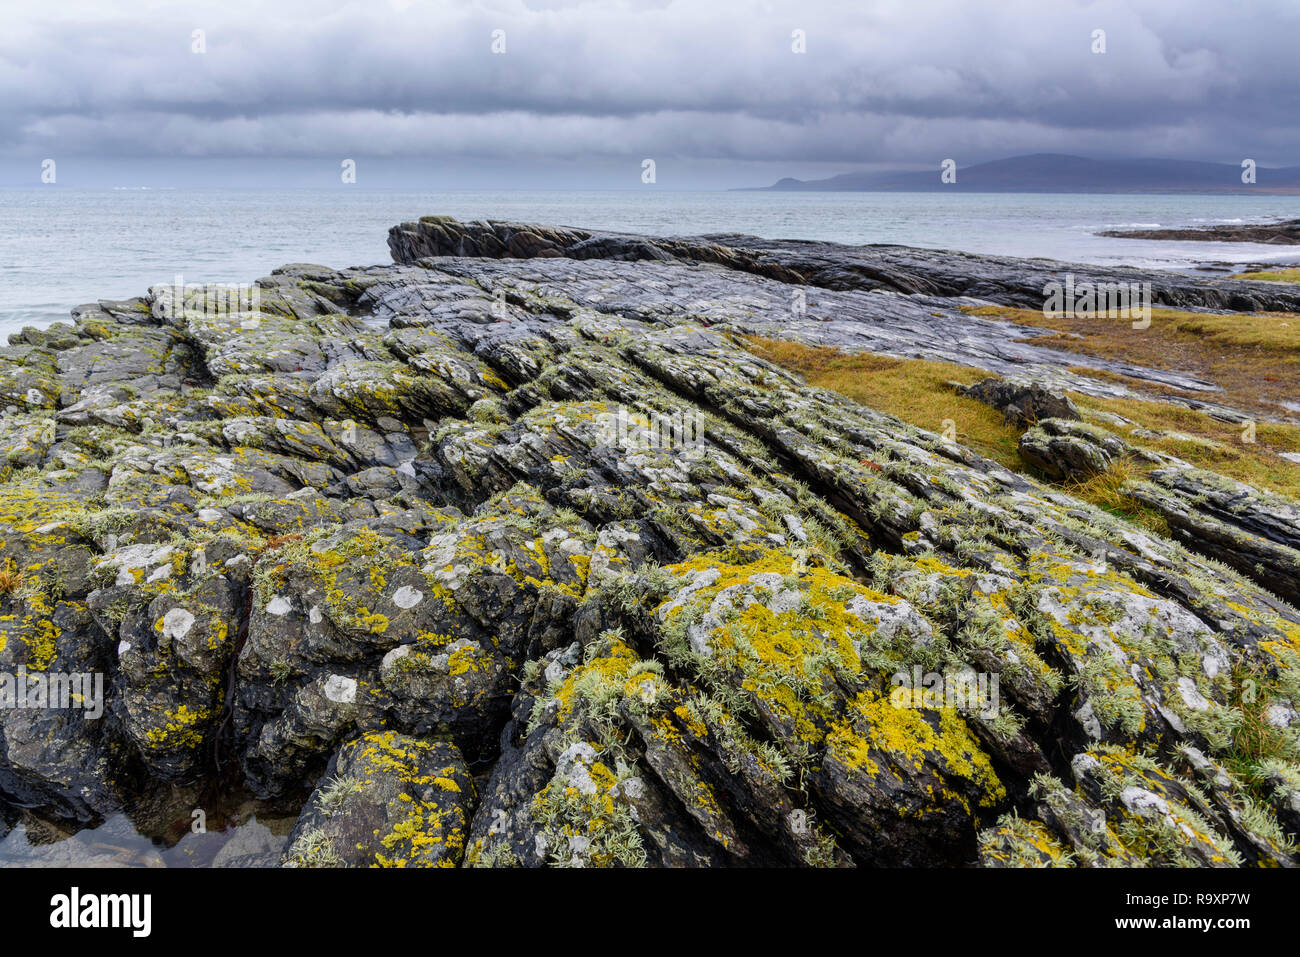 Ardnave Point, Islay, looking towards Jura, Inner Hebrides, Argyll & Bute, Scotland Stock Photo